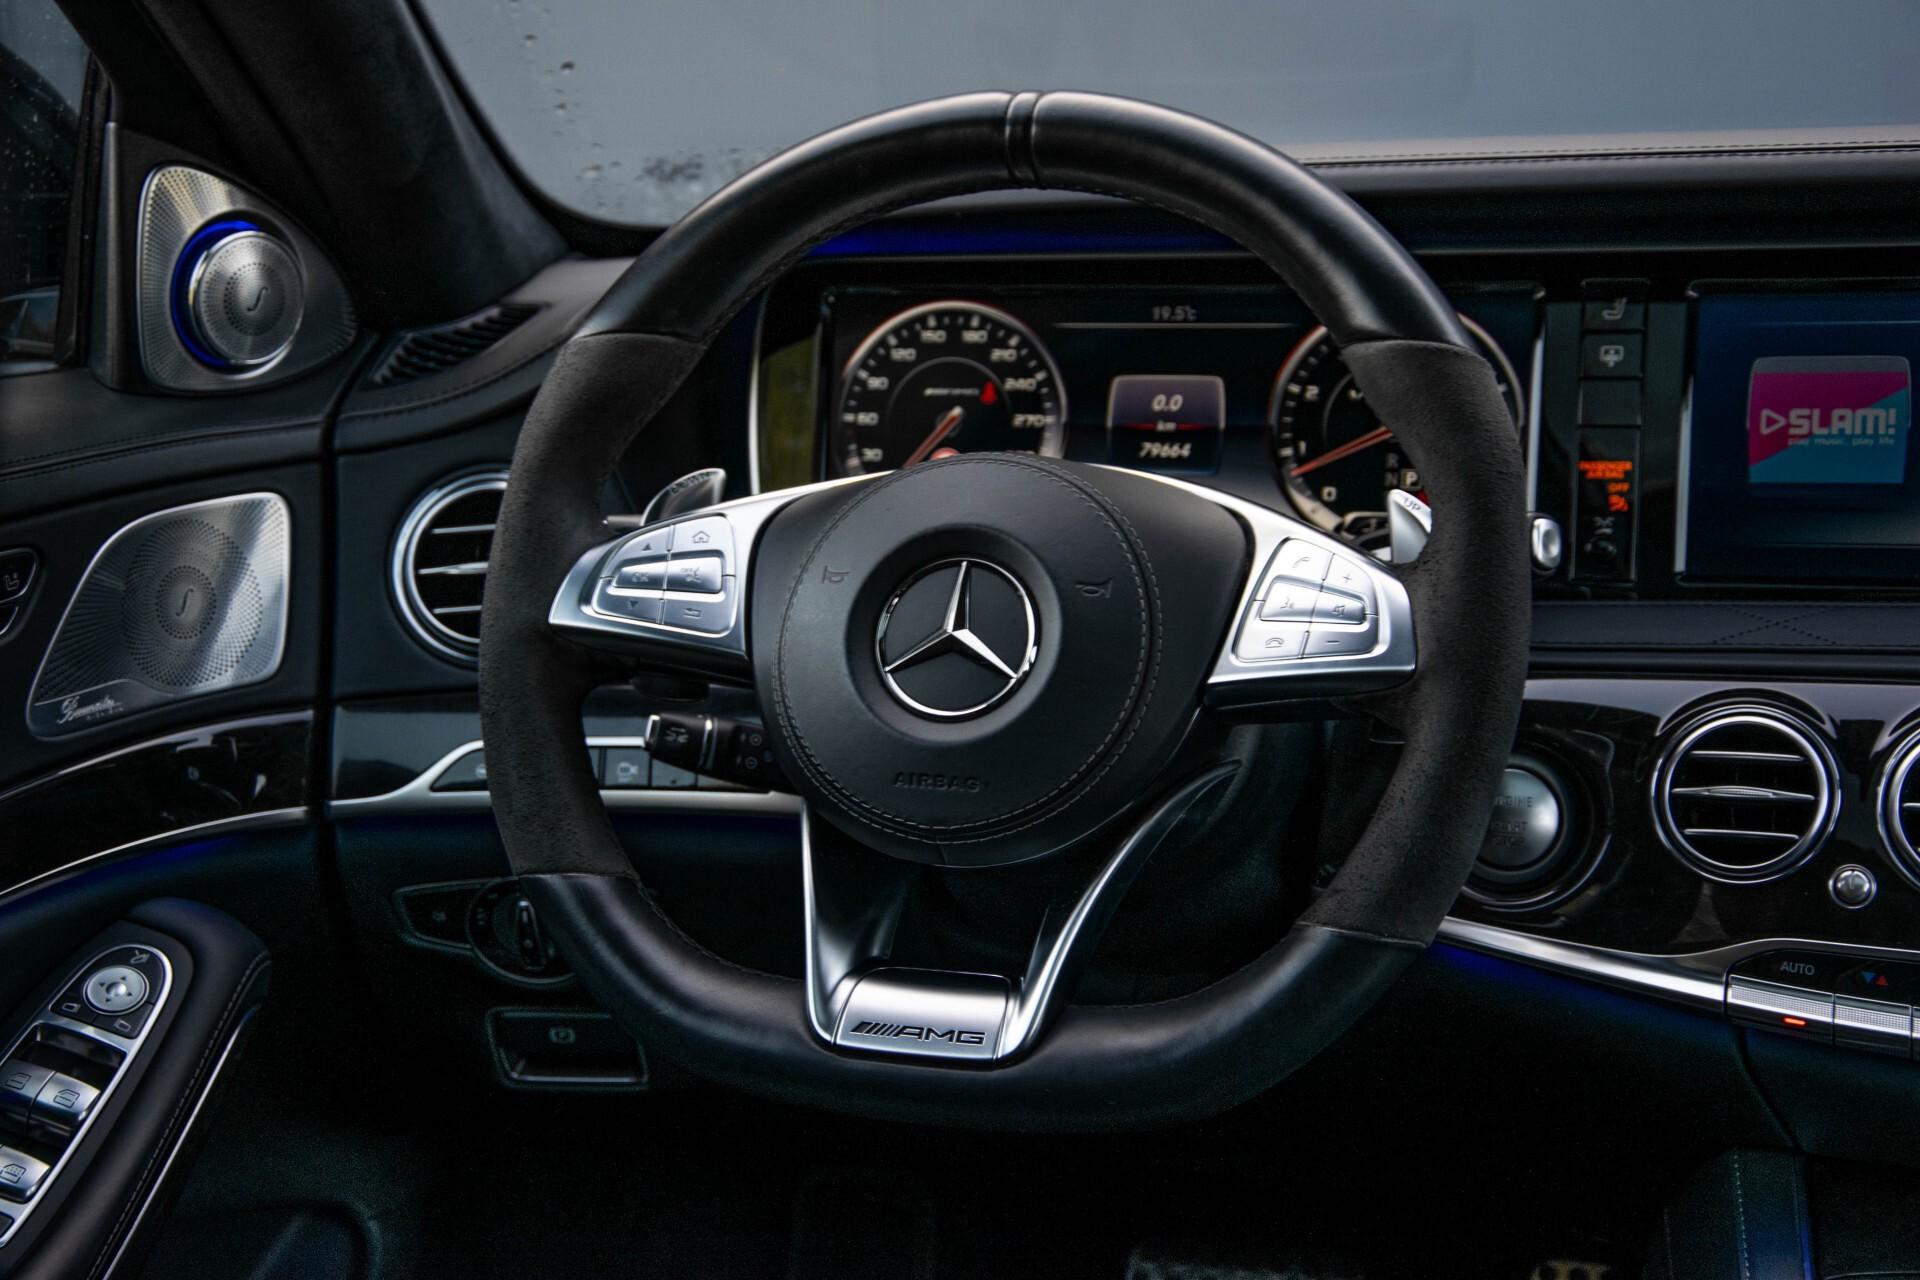 Mercedes-Benz S-Klasse 63 AMG Exclusive/Burmester High-End/Driverspack Aut7 Foto 8